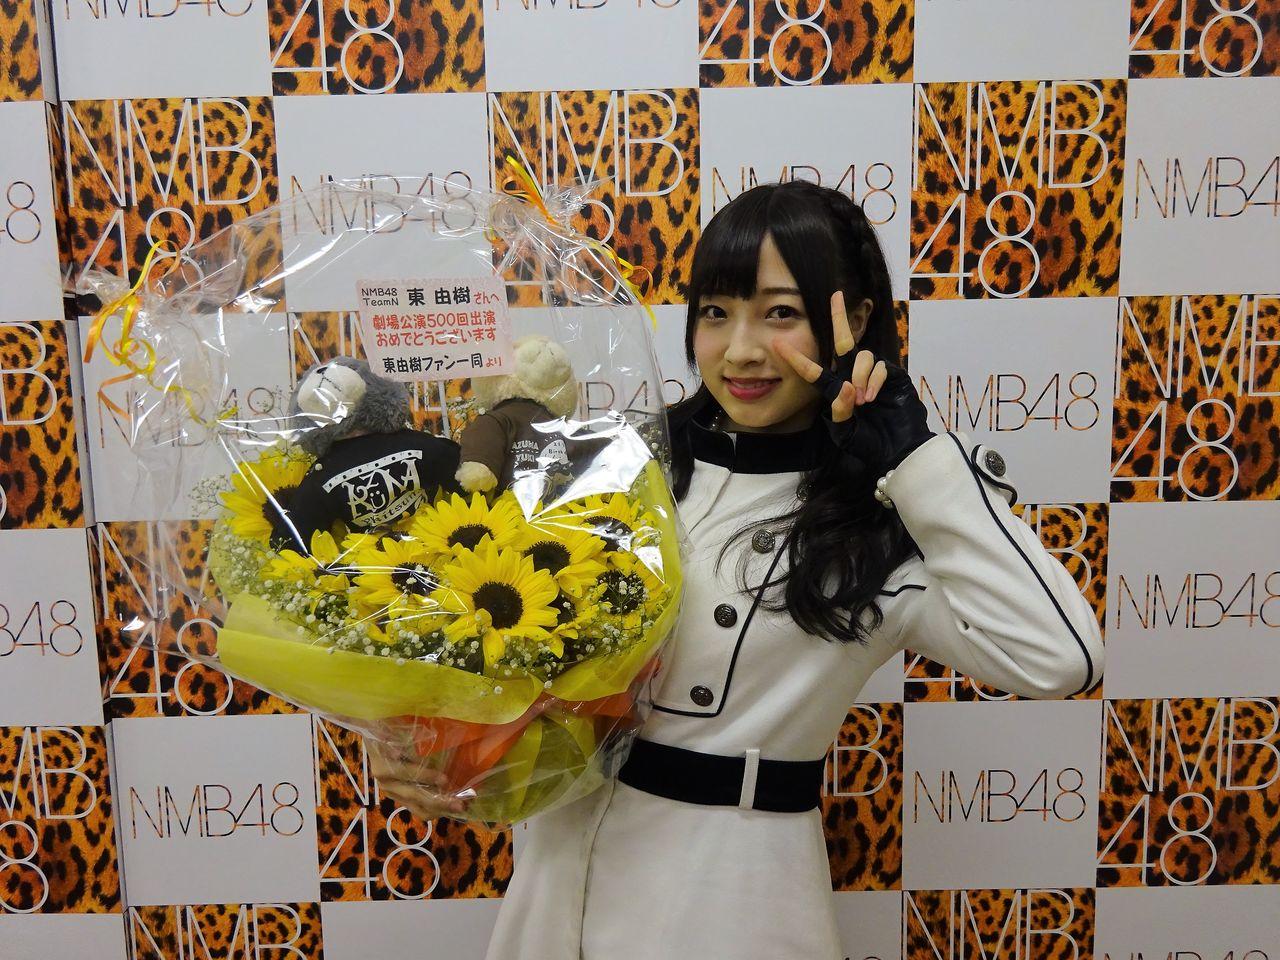 【NMB48】東由樹、4人目500回公演キタ━━━━(゚∀゚)━━━━!!